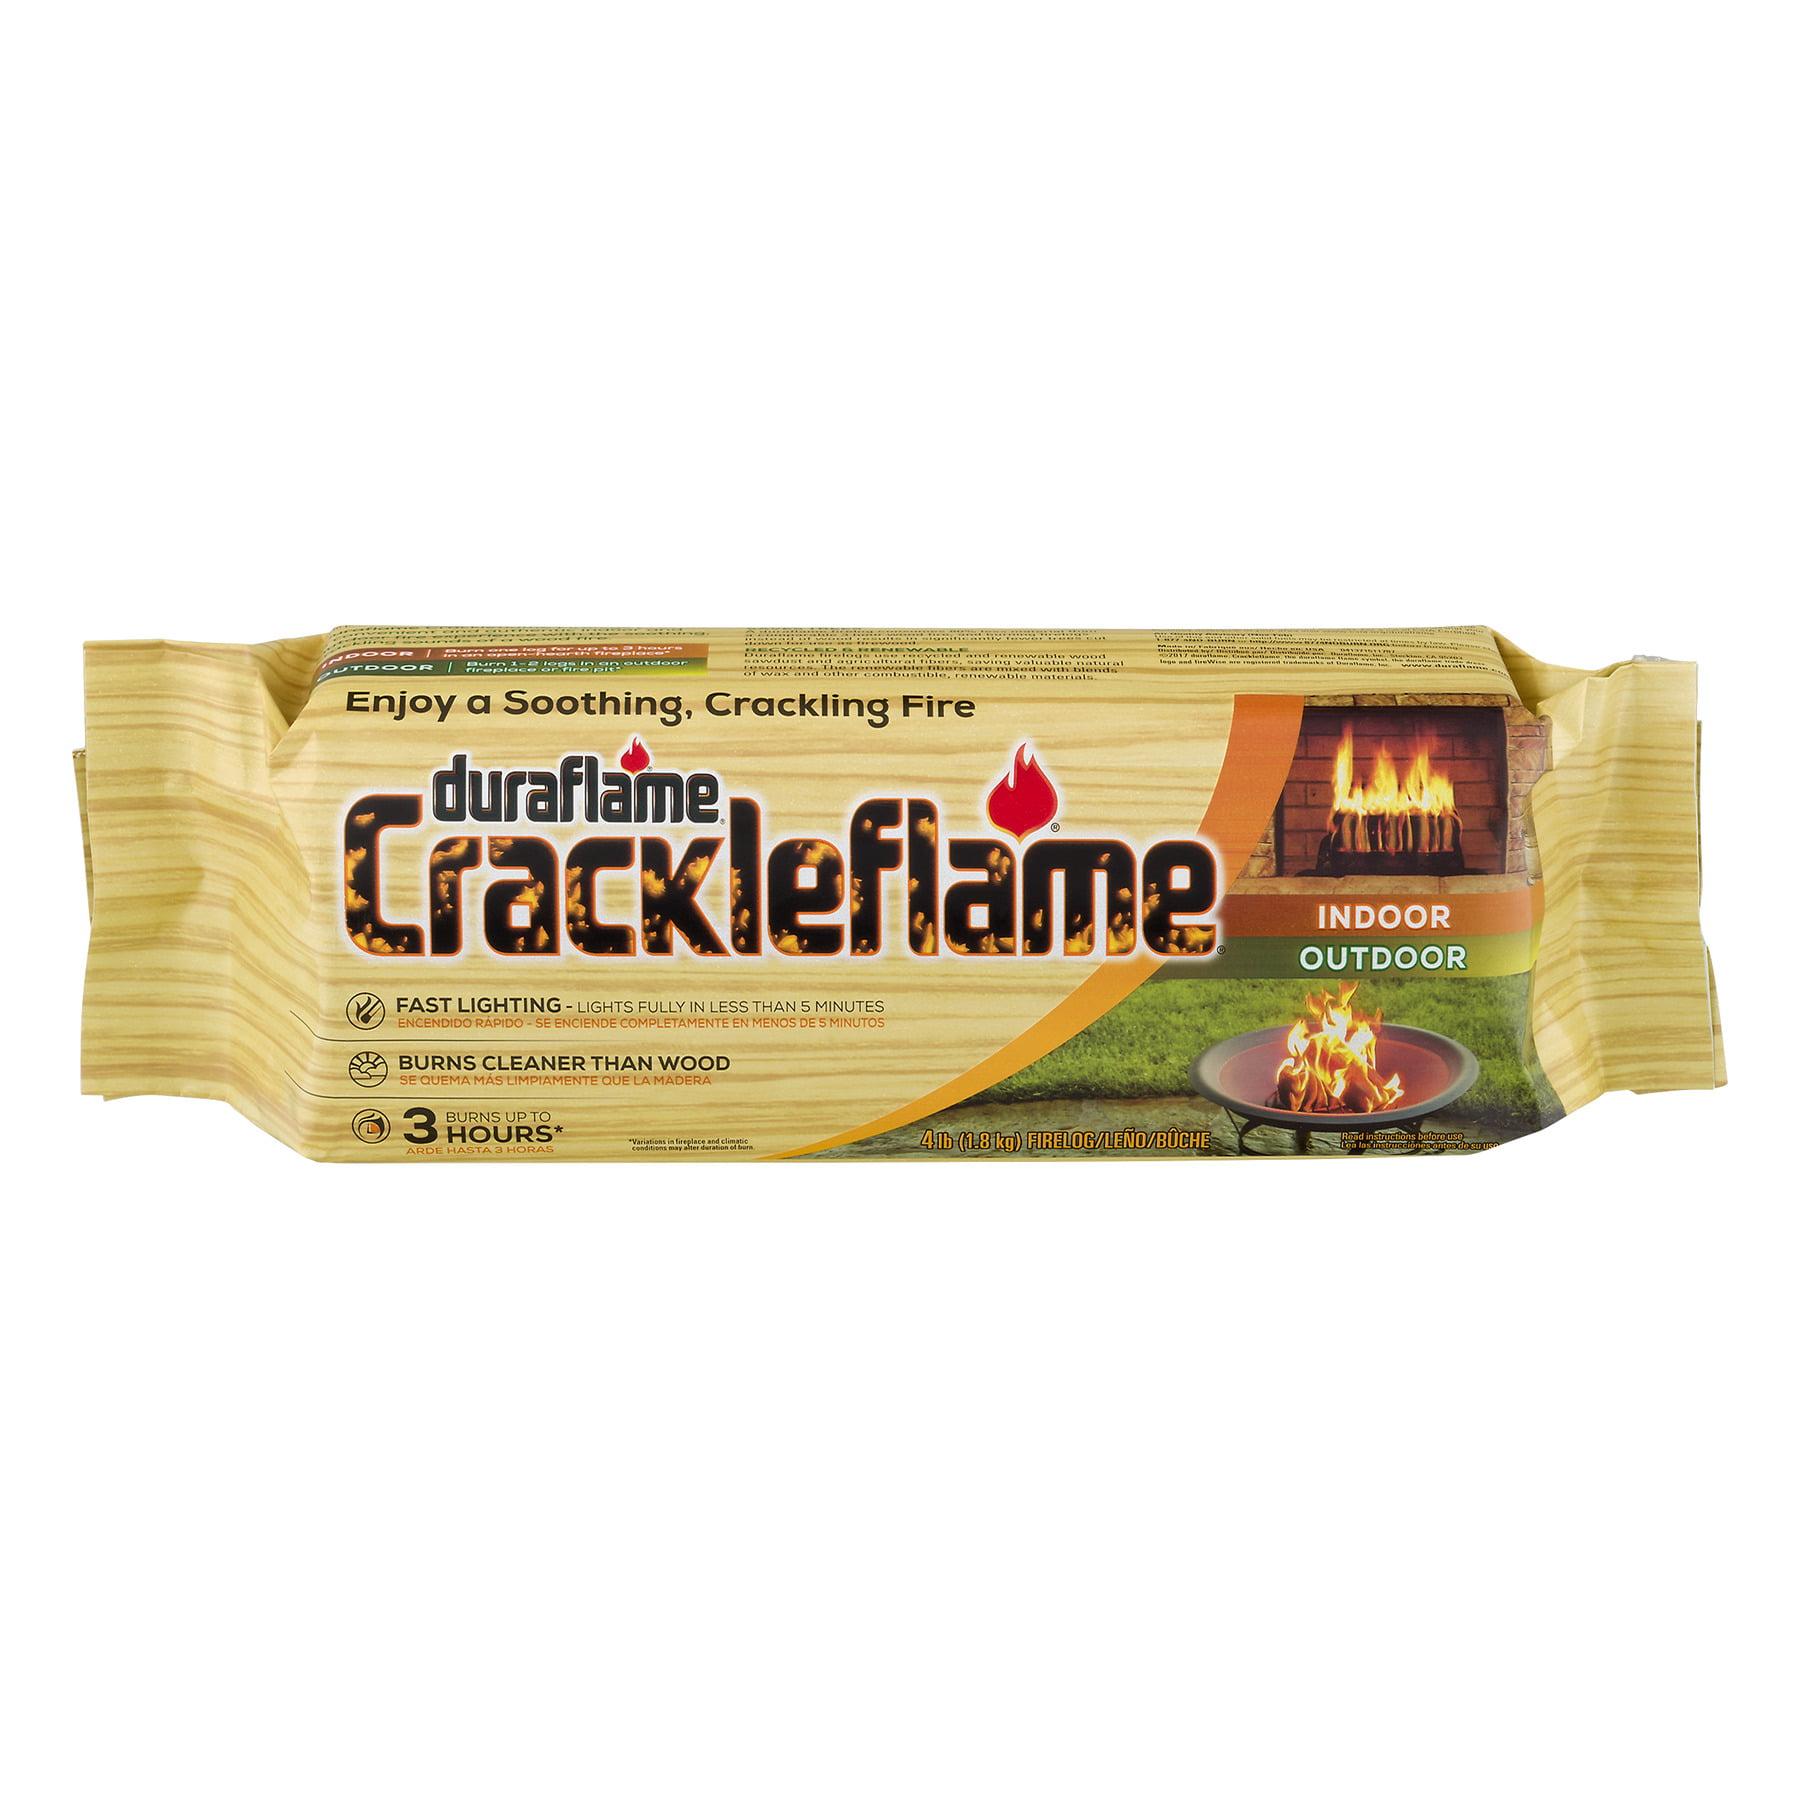 duraflame® Crackleflame® 4lb 3-hr Indoor/ Outdoor Firelog